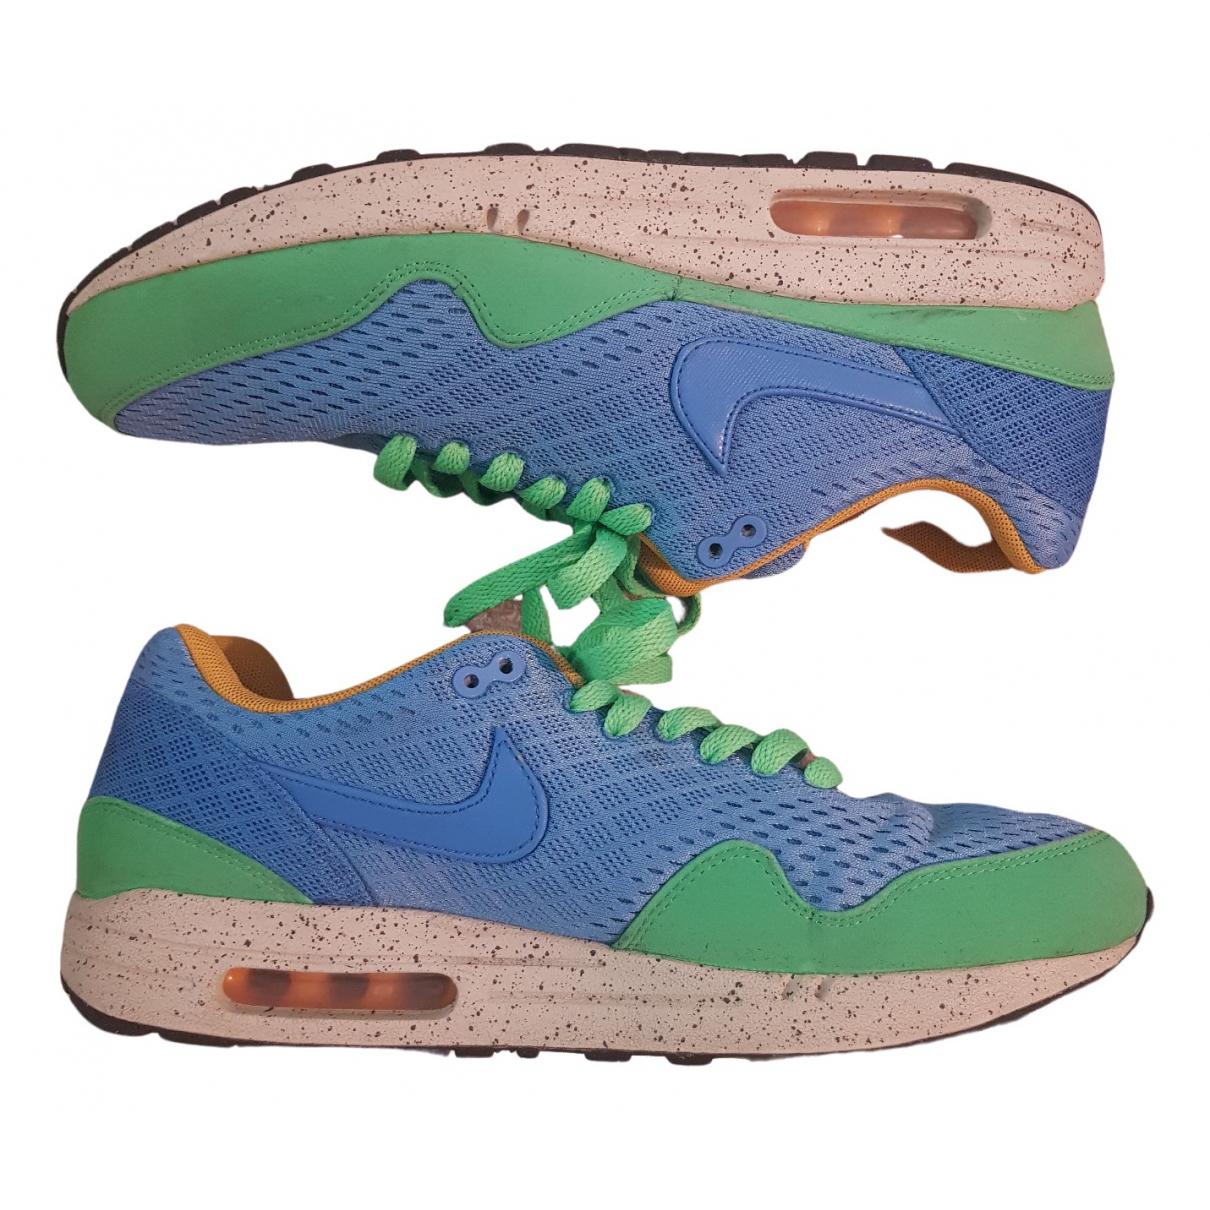 Nike - Baskets Air Max 1 pour homme en toile - bleu